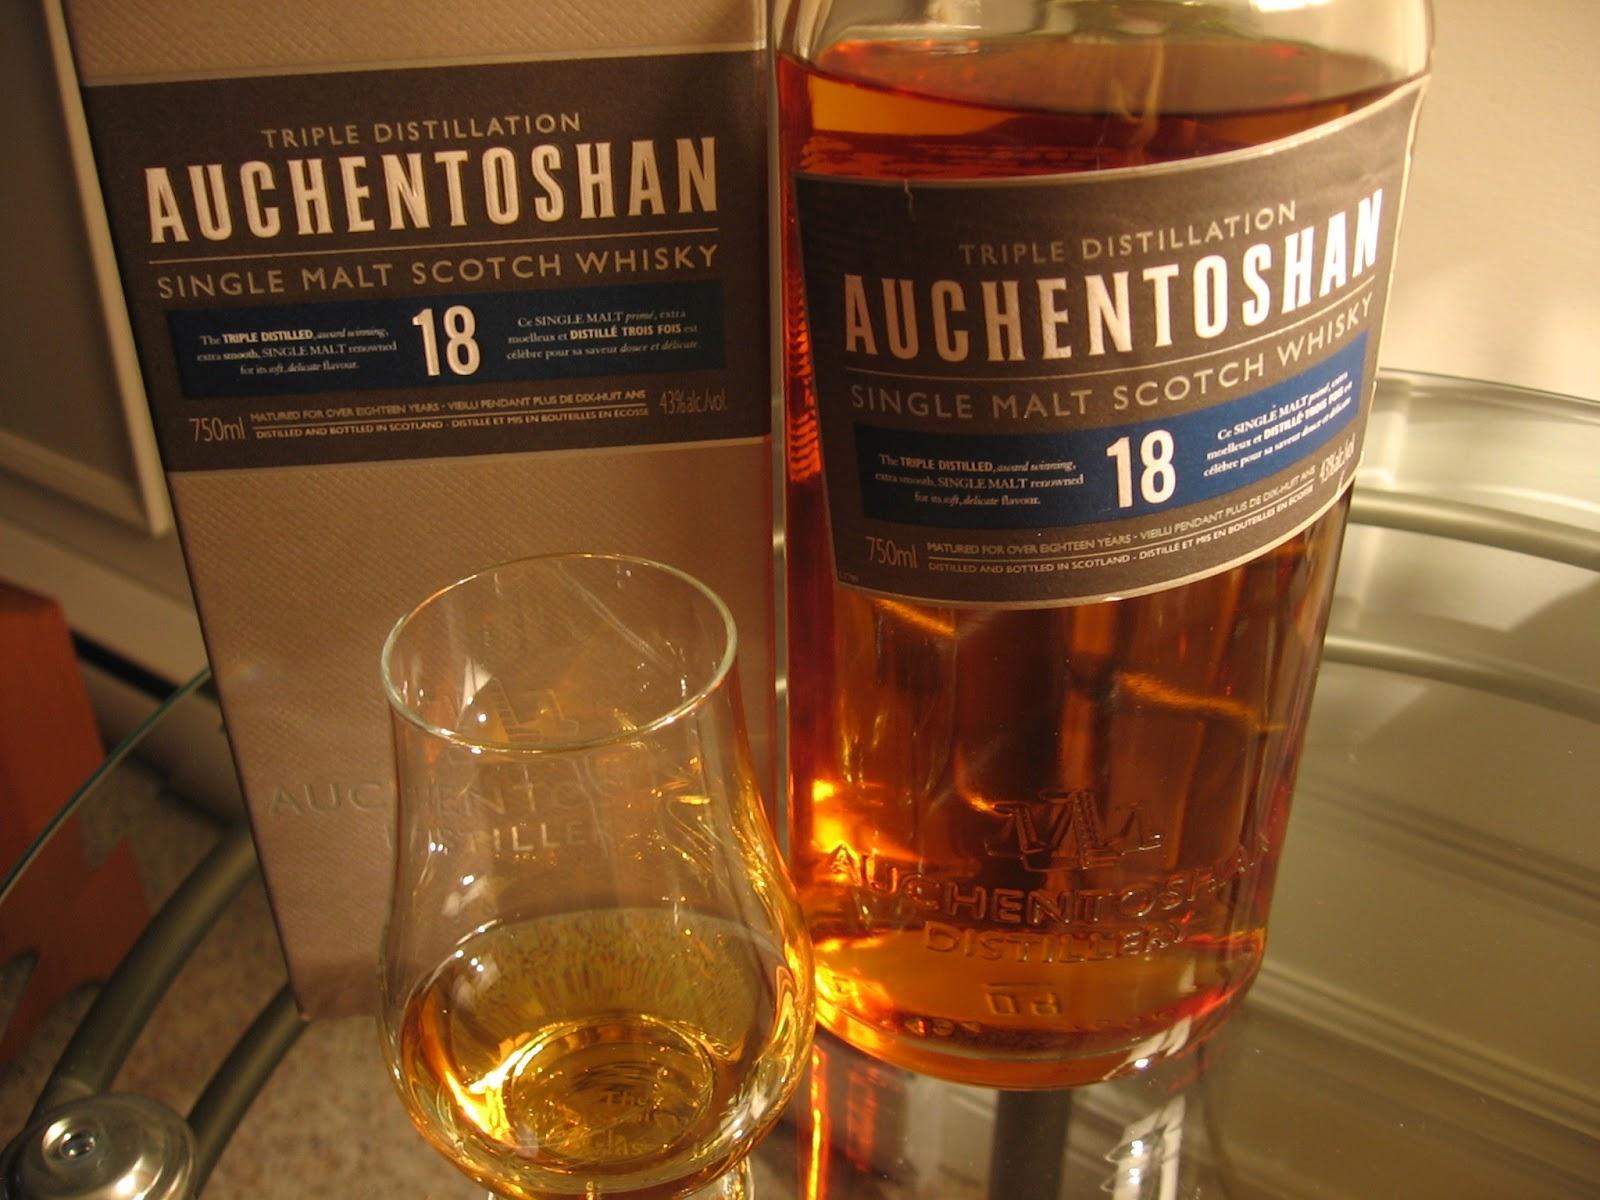 Auchentoshan 18 Year Old Whisky